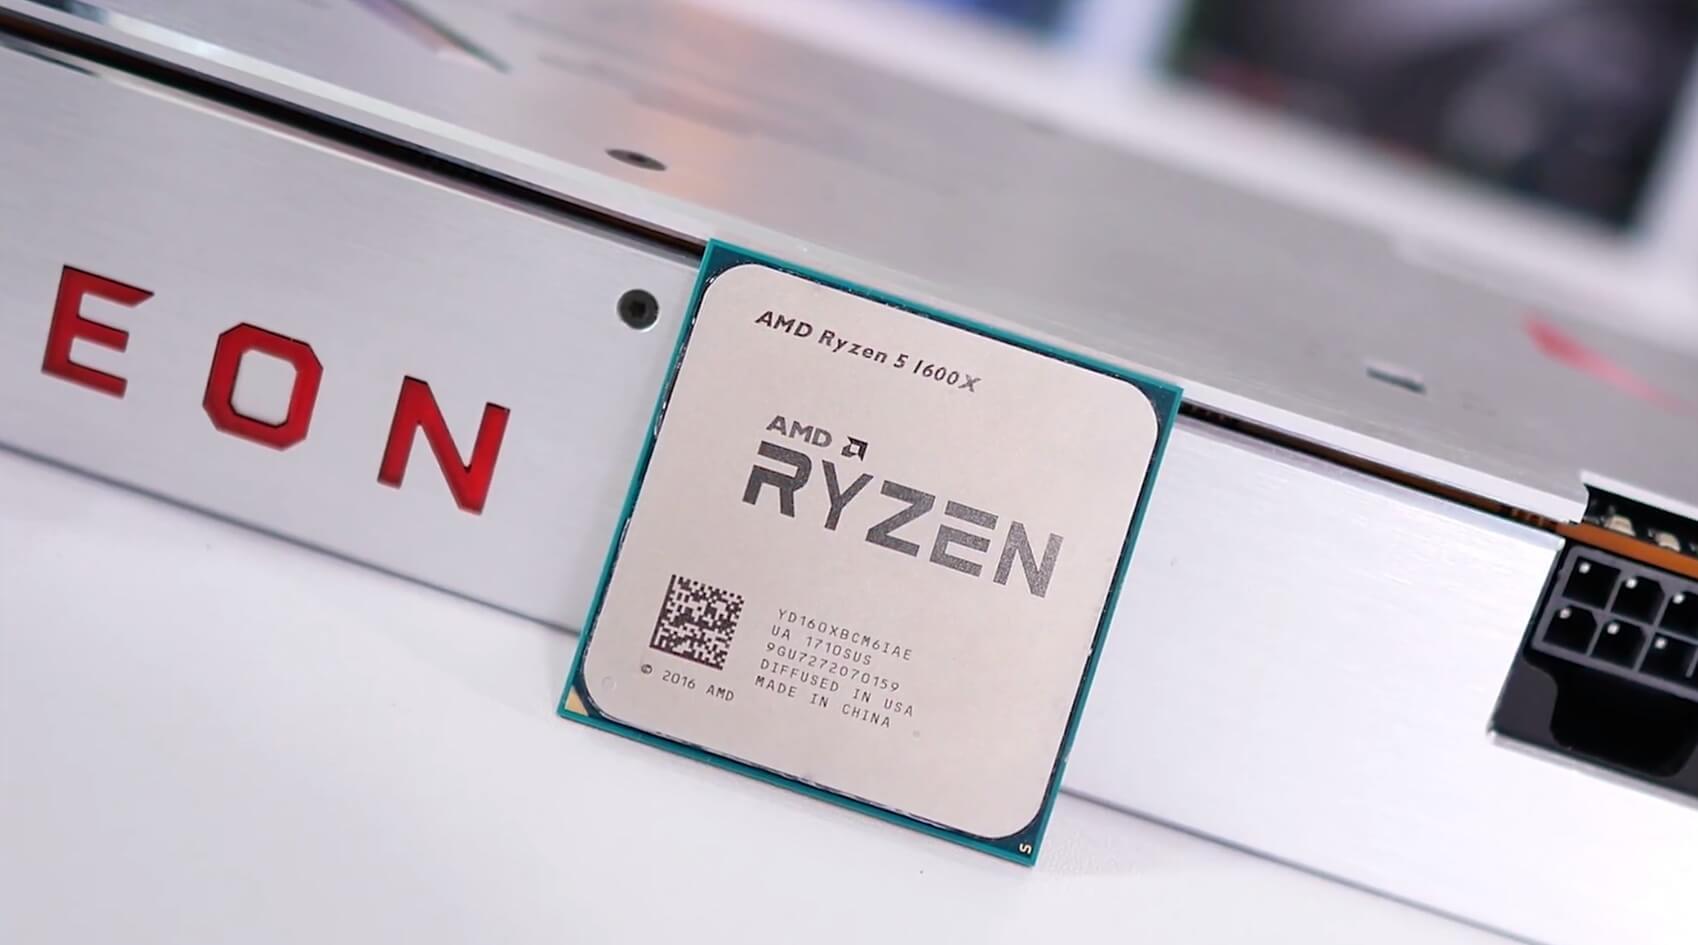 Intel Core i7-8700K ، i5-8600K ، 8400 مقابل AMD Ryzen 7 1800X ، R5 1600X ، 1500X 1